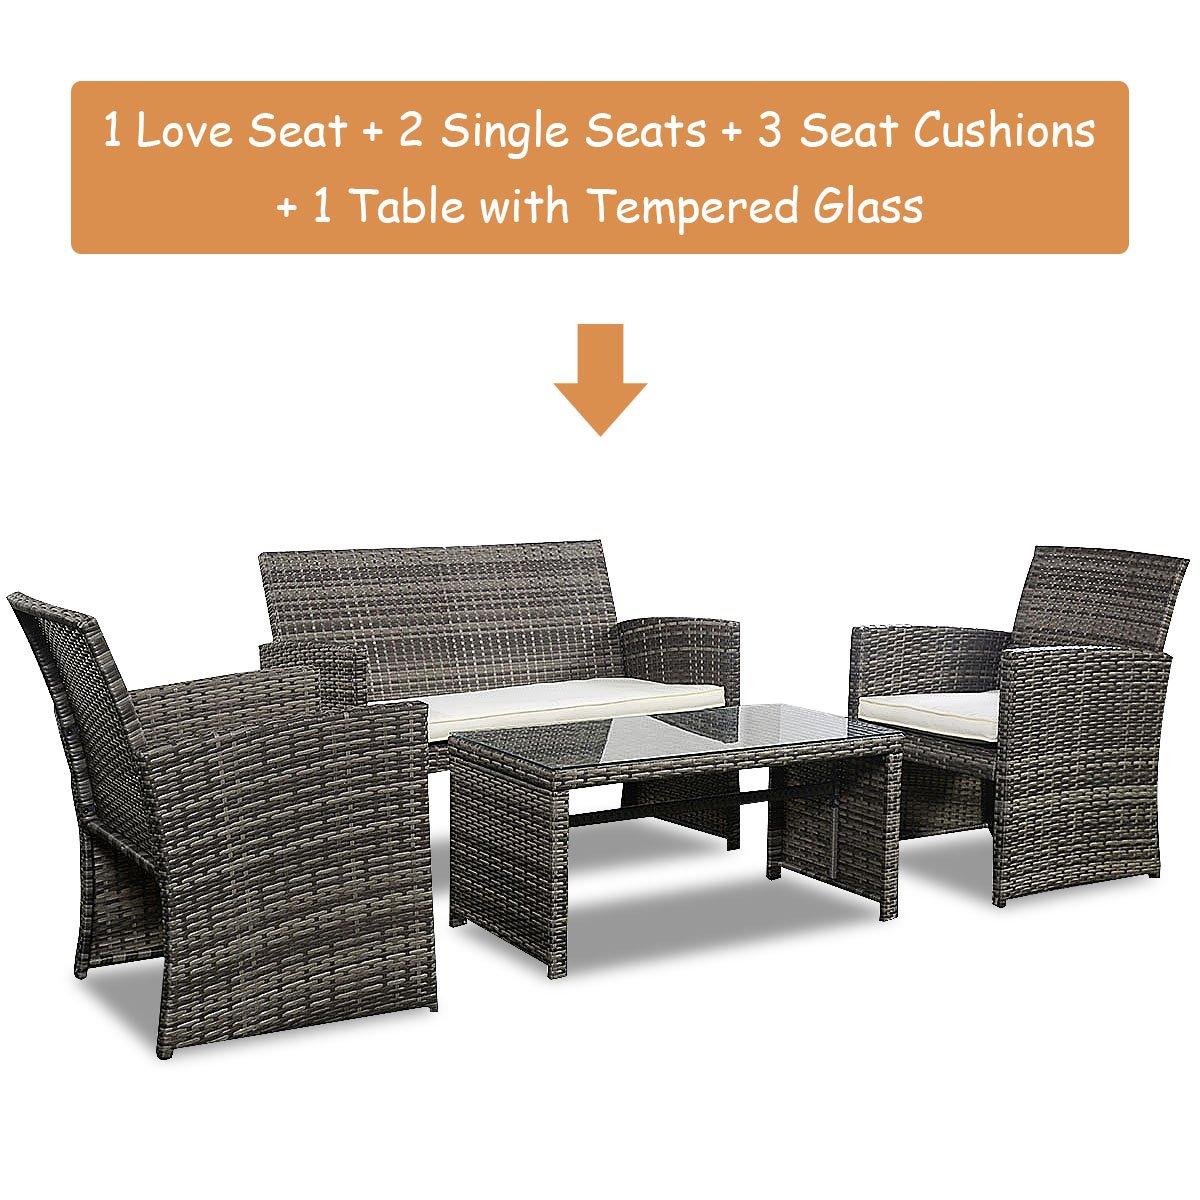 Goplus 4 PC Rattan Patio Furniture Set Garden Lawn Sofa Cushioned Seat Wicker Sofa (Mix Gray) by Goplus (Image #8)